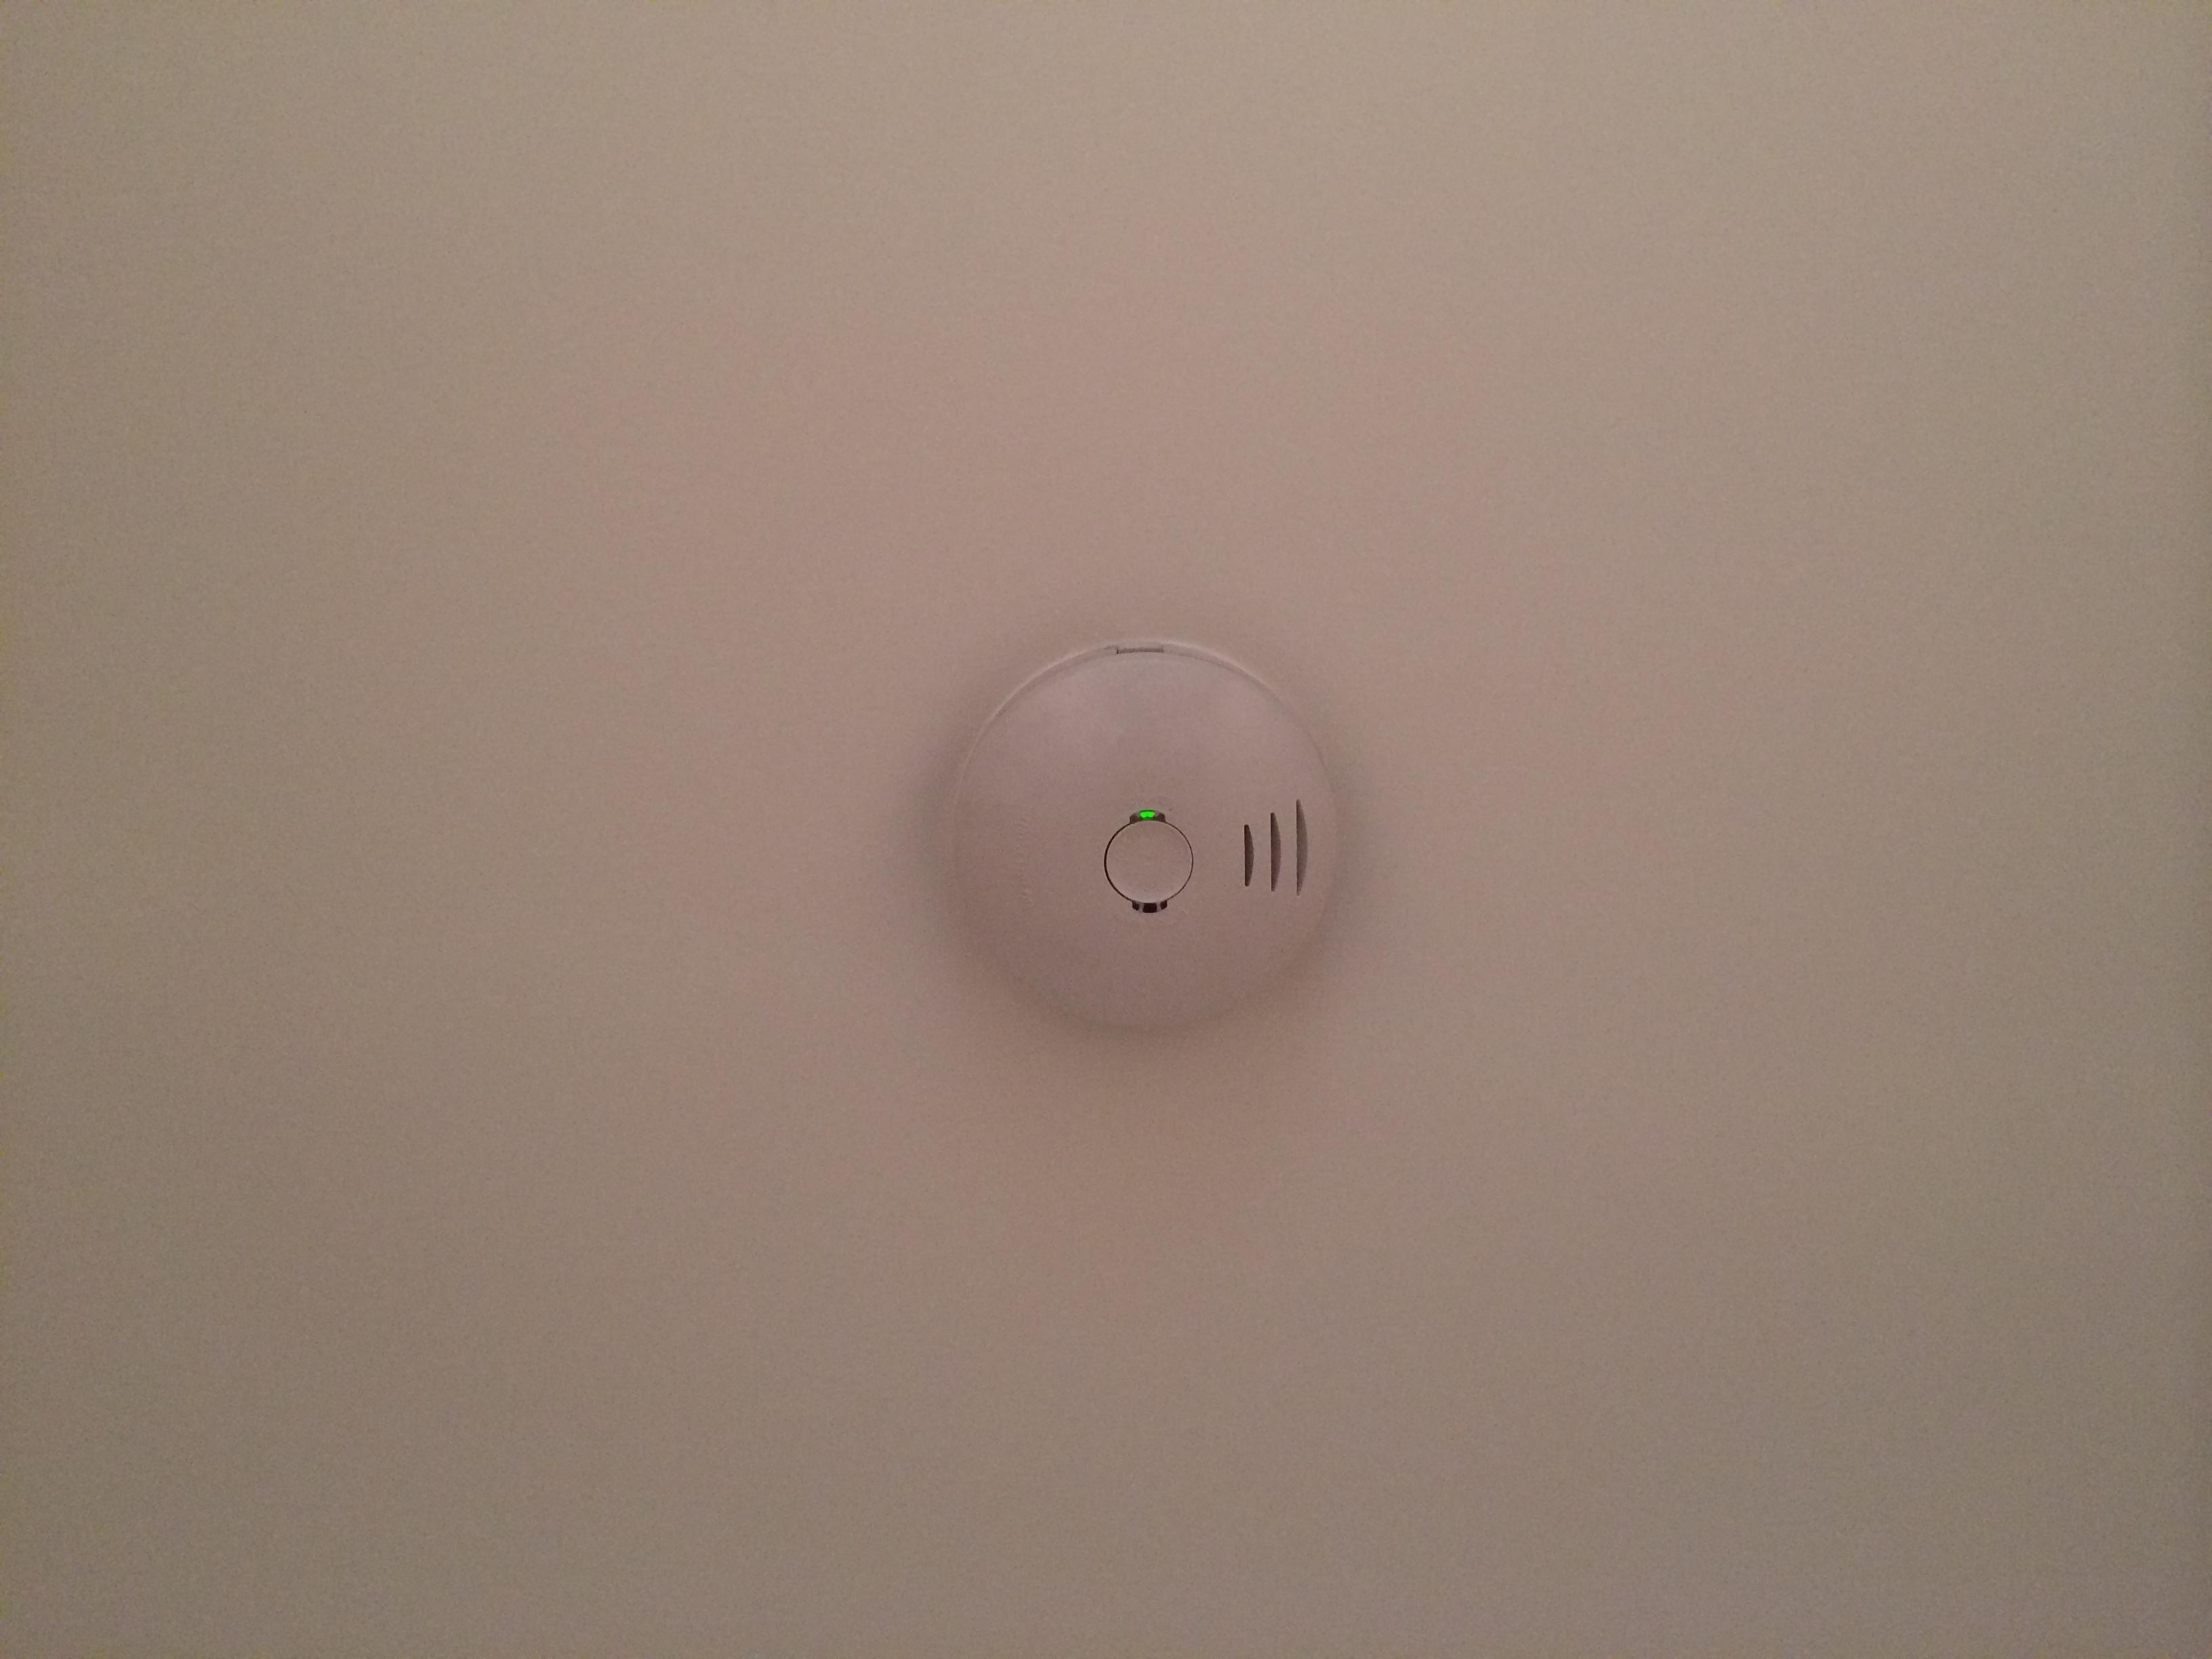 Residential - Smoke Alarm Detector installation